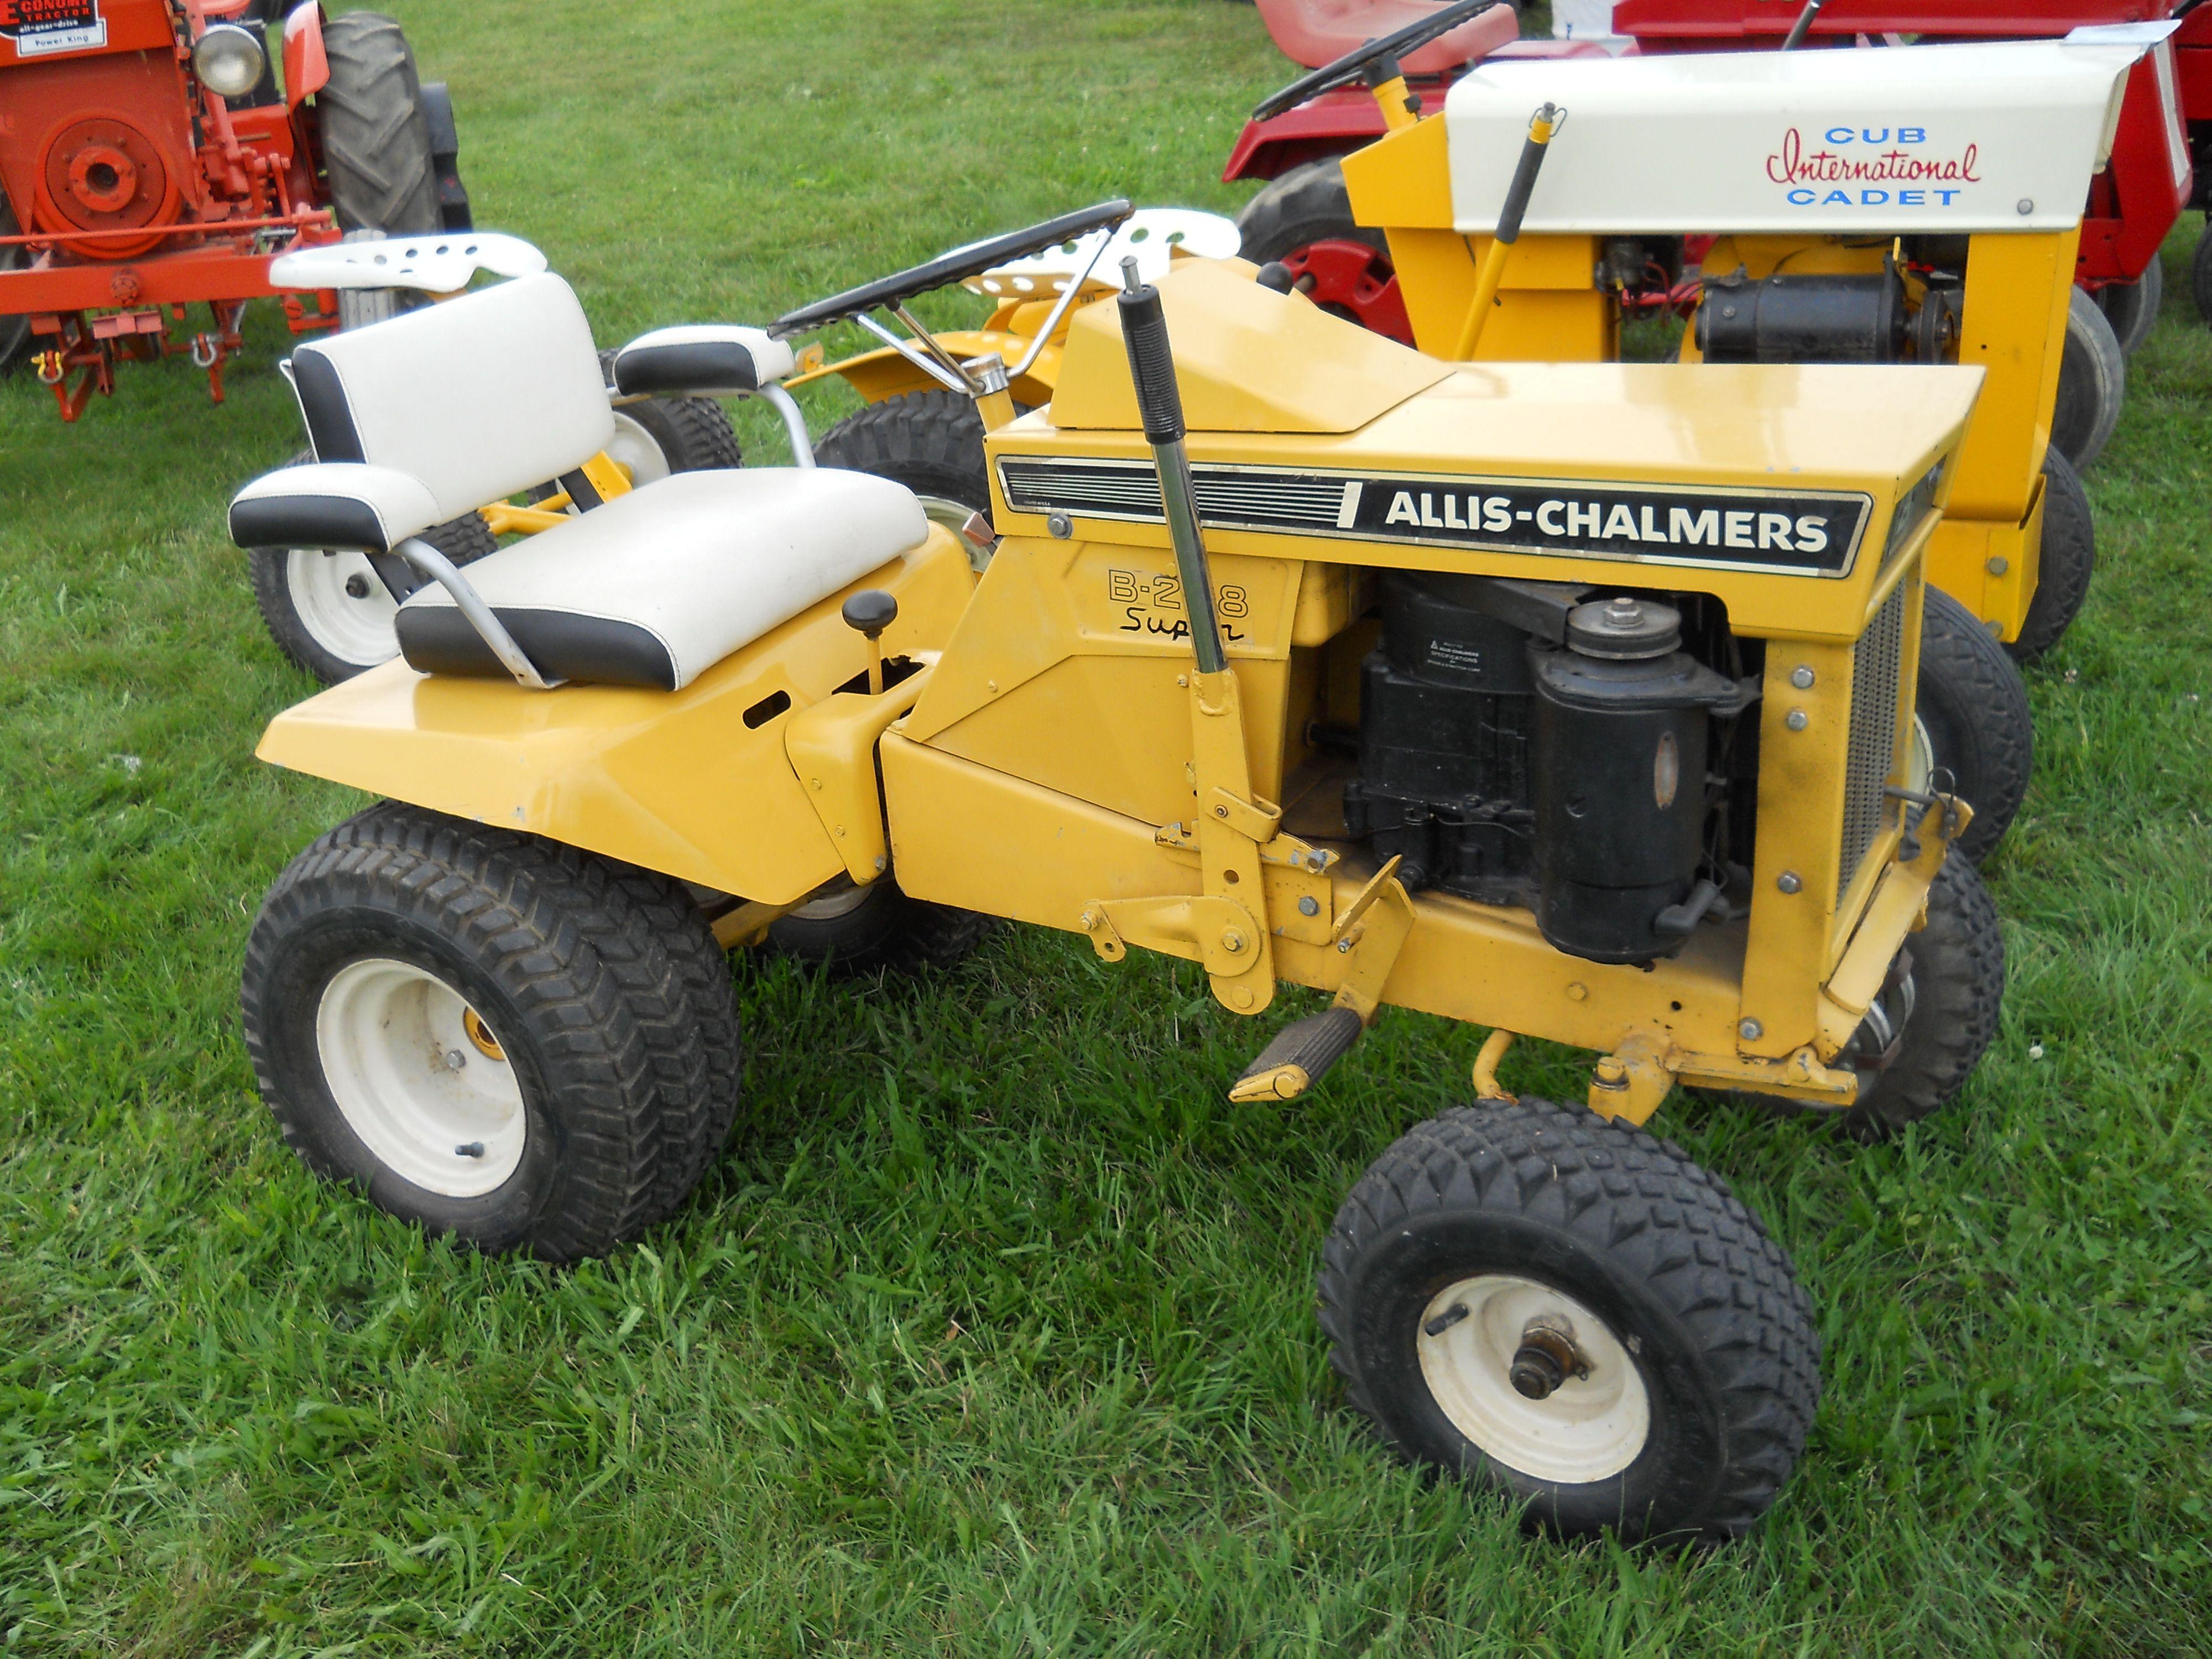 Little Allis Chalmers Tractor Https://www.youtube.com/user/